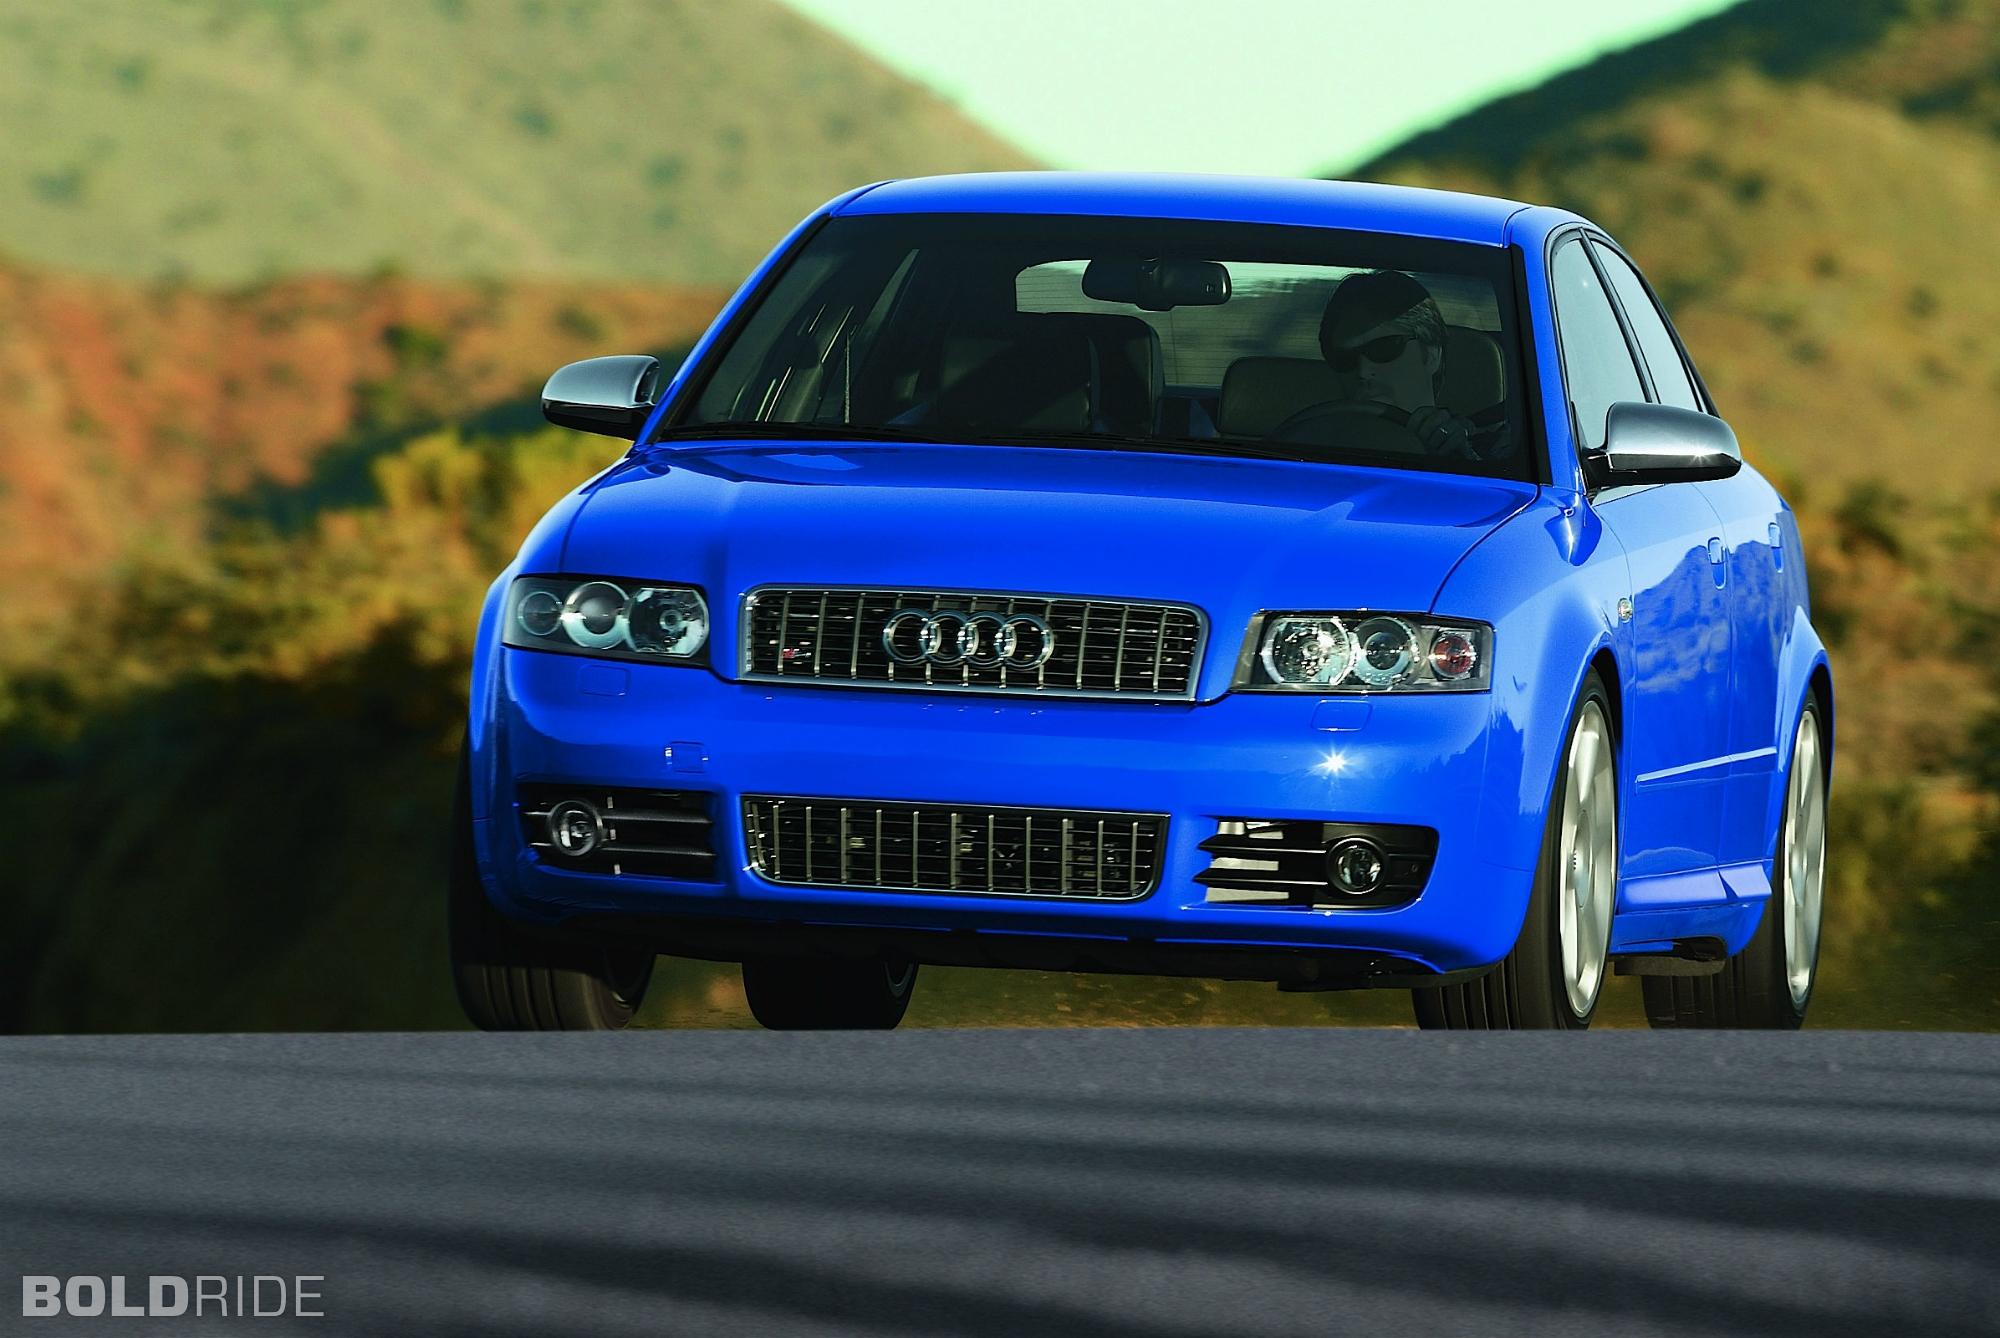 2002 Audi S4 Image 22